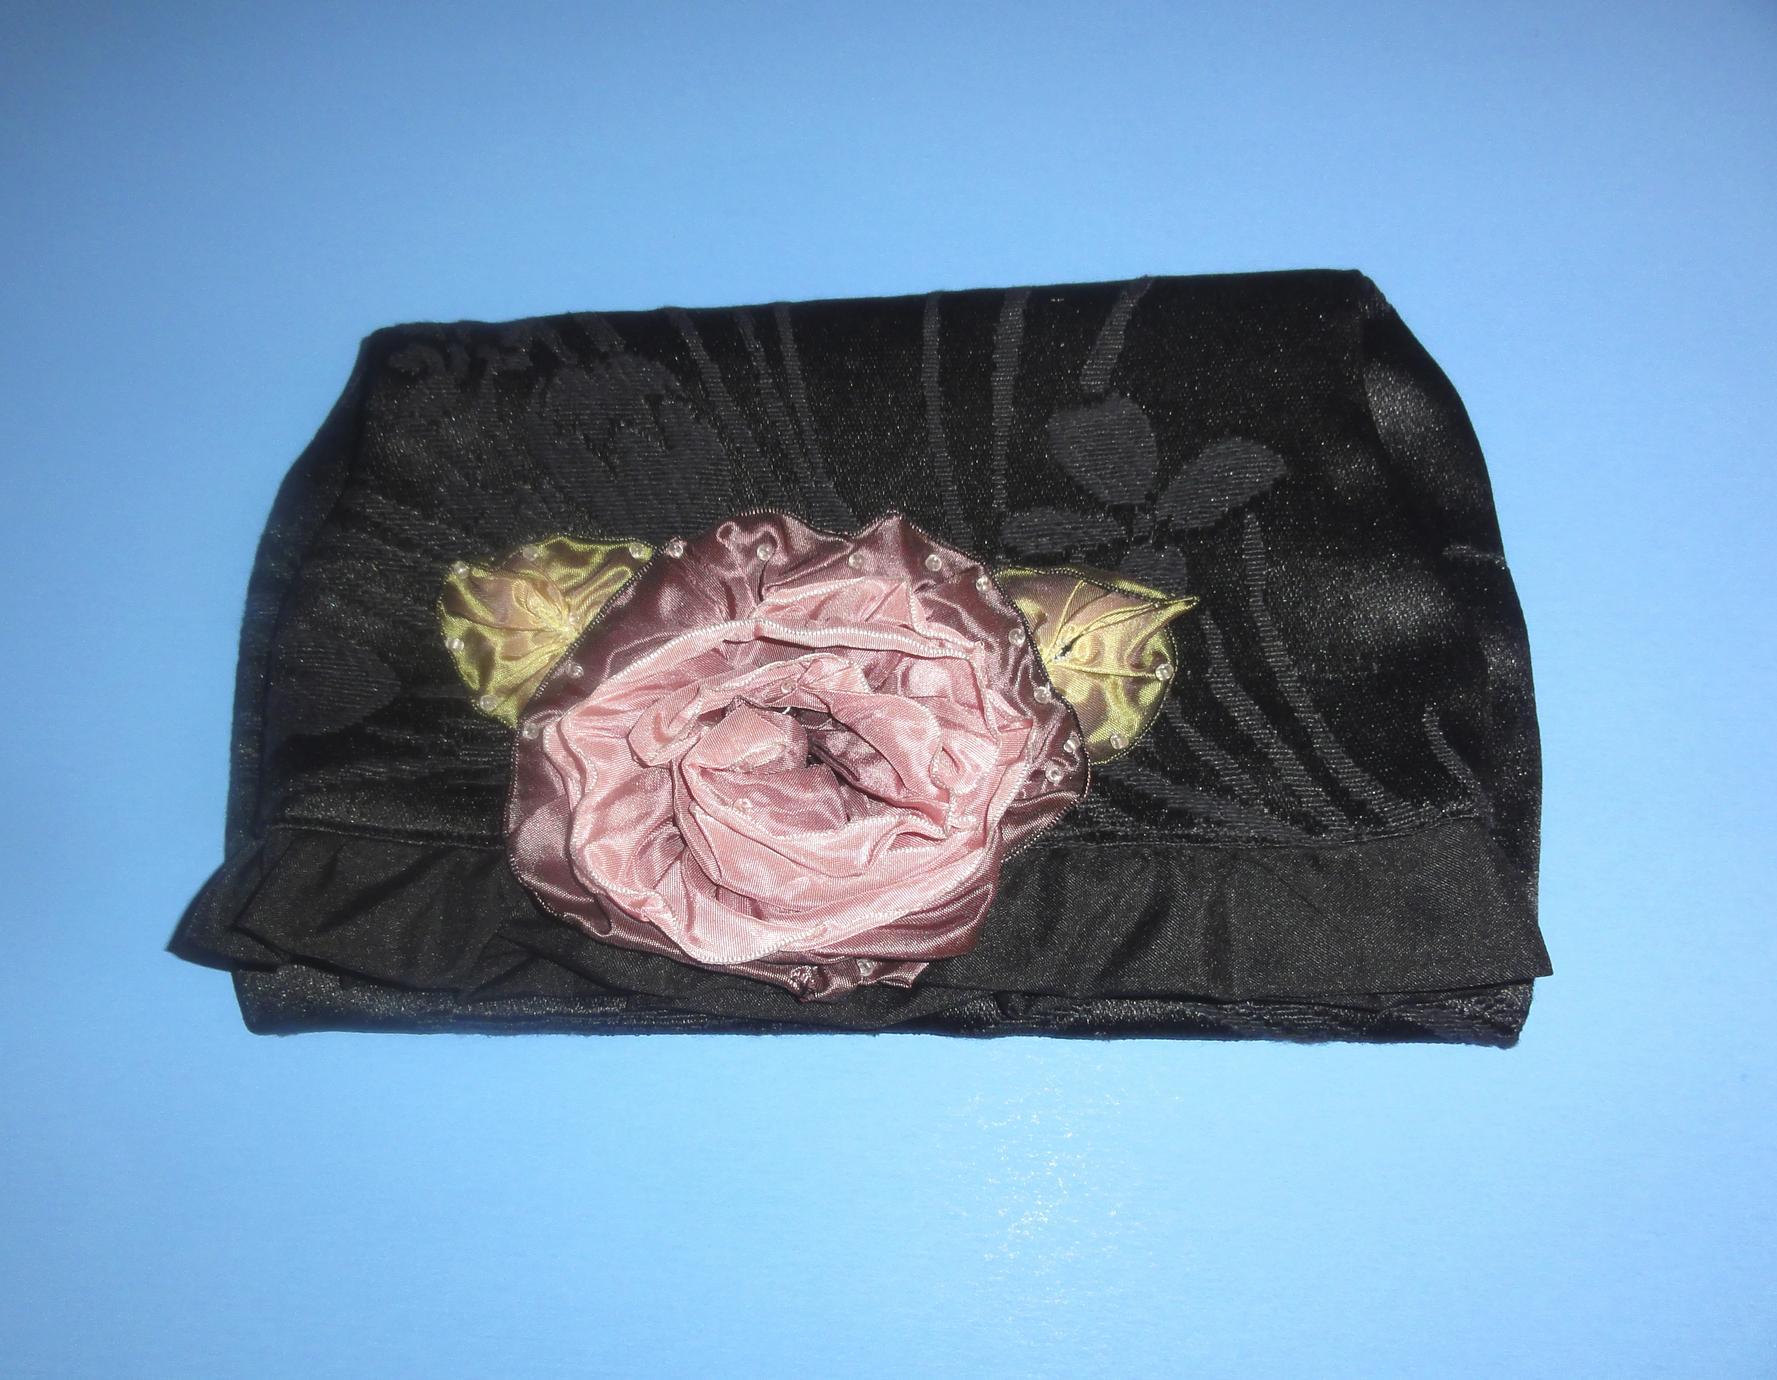 Black clutch bag with rose